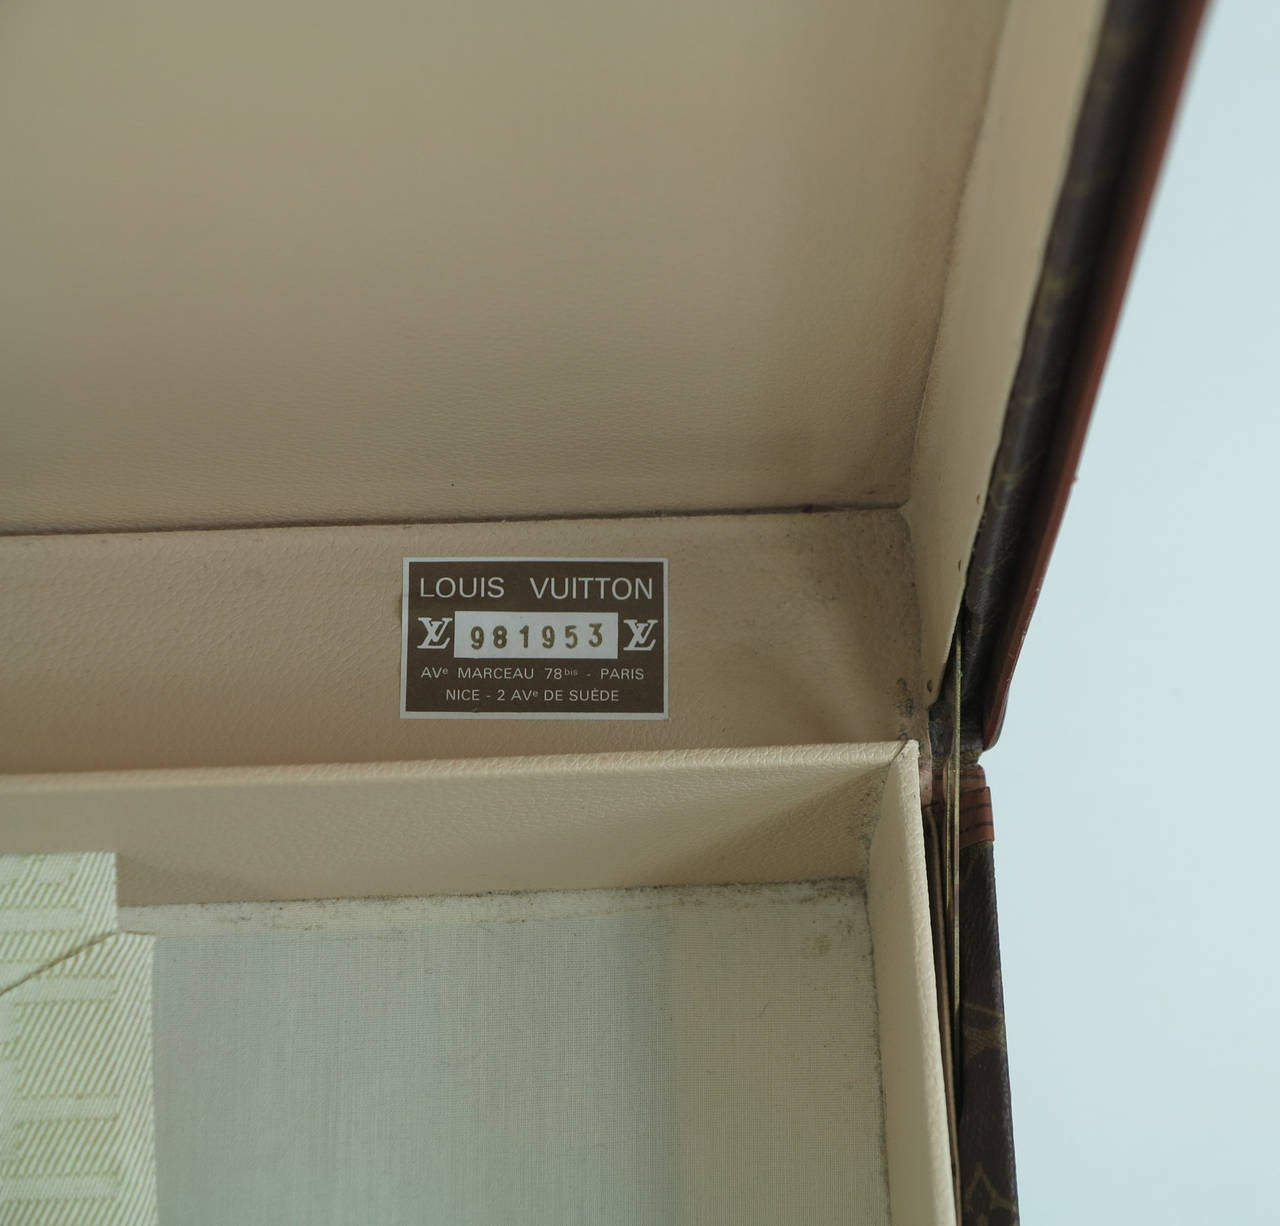 Louis Vuitton Alzar 80 monogram hardside suitcase/trunk 8